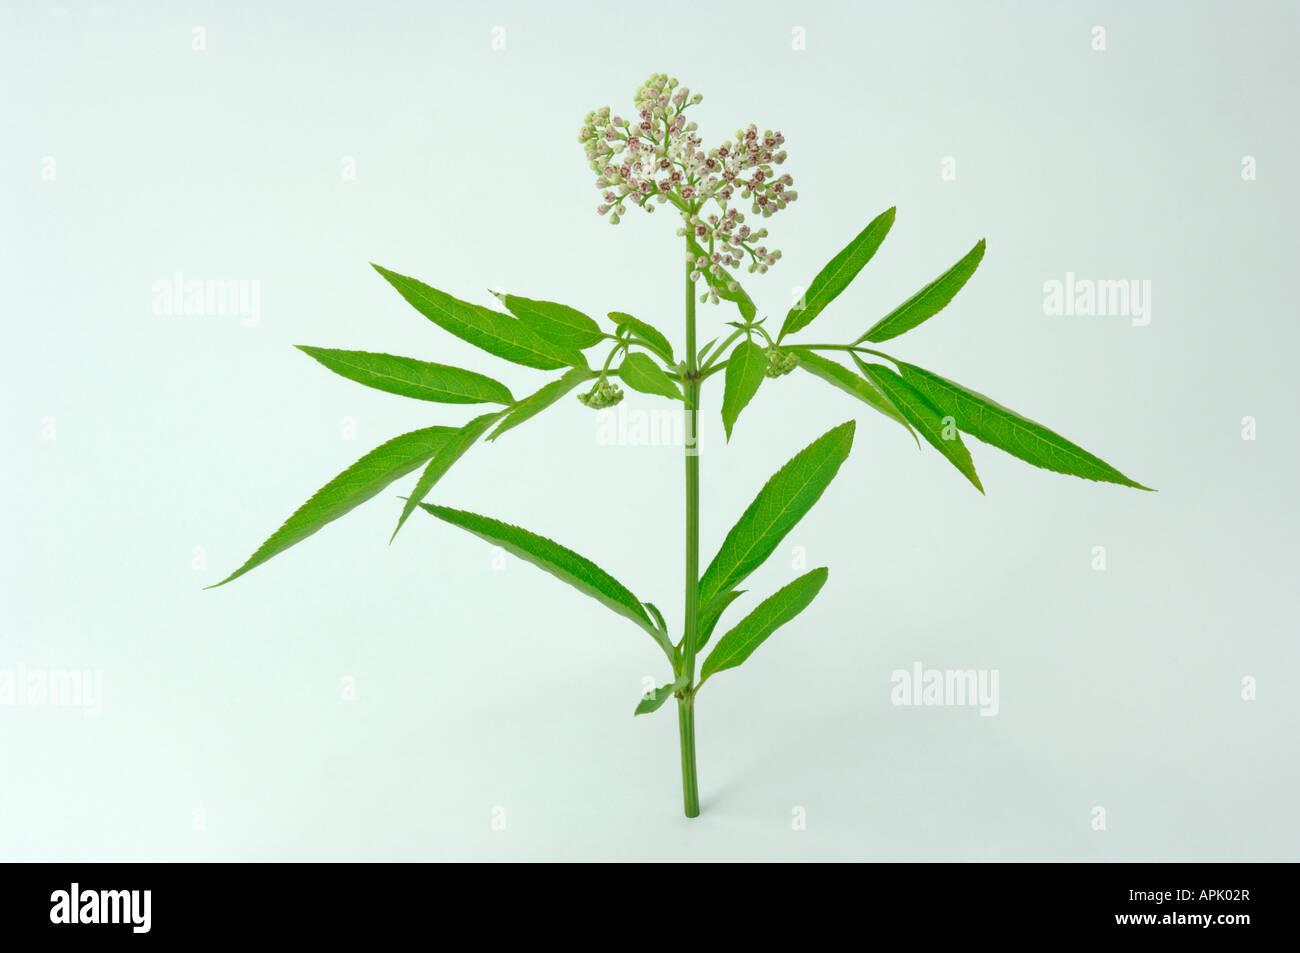 Danewort, Dwarf Elder, European Dwarf Elder, Walewort (Sambucus ebulus), flowering twig, studio picture - Stock Image